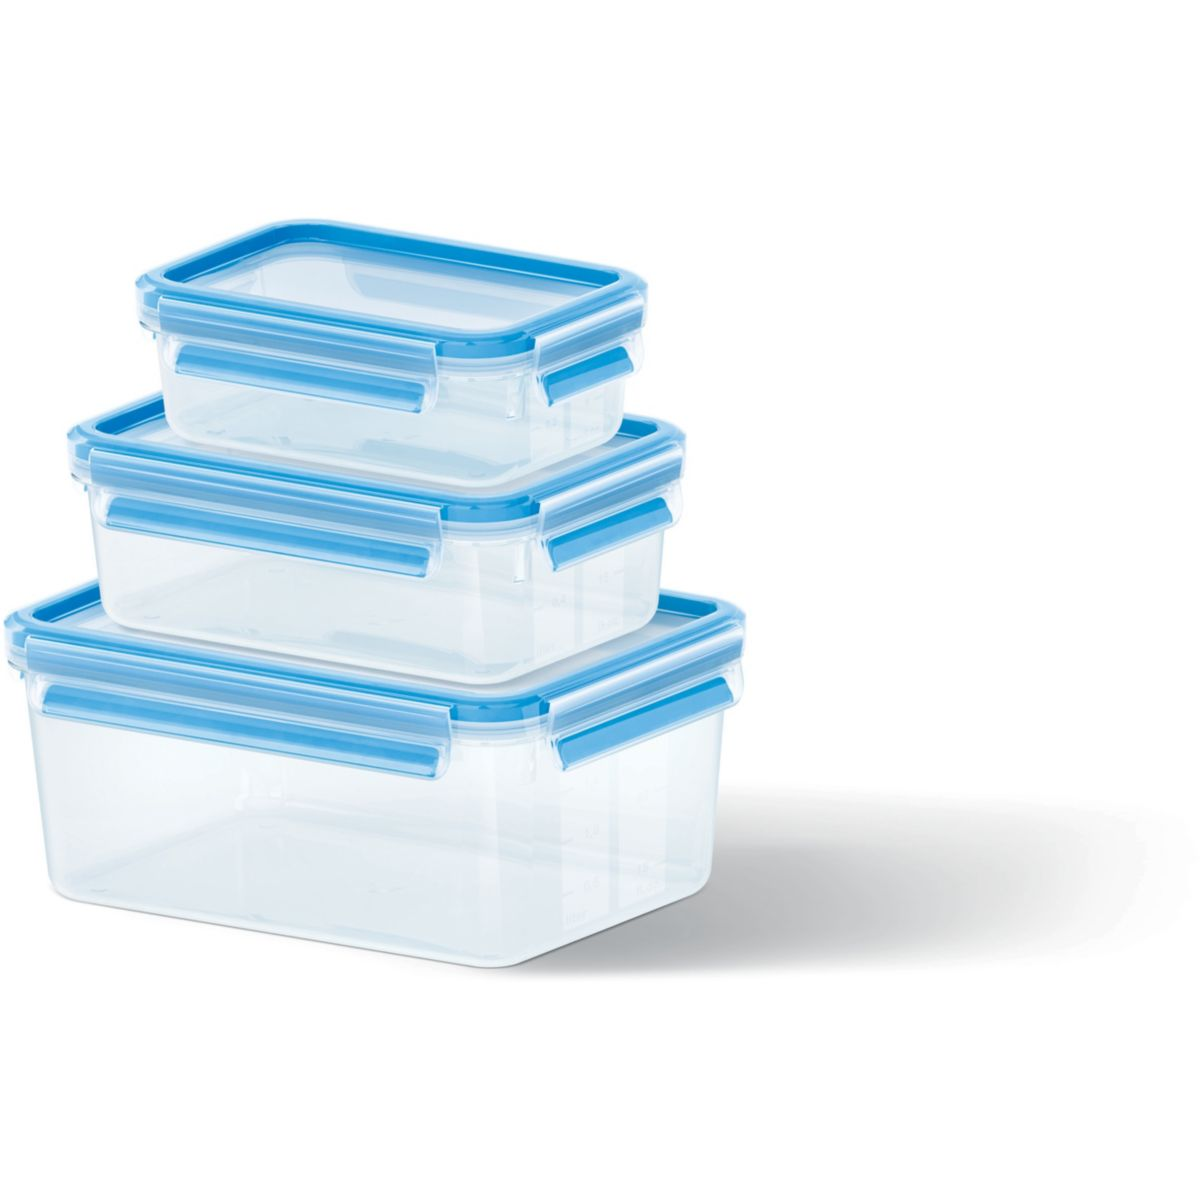 Boîte aliment emsa 2.3l clip & close pla (photo)